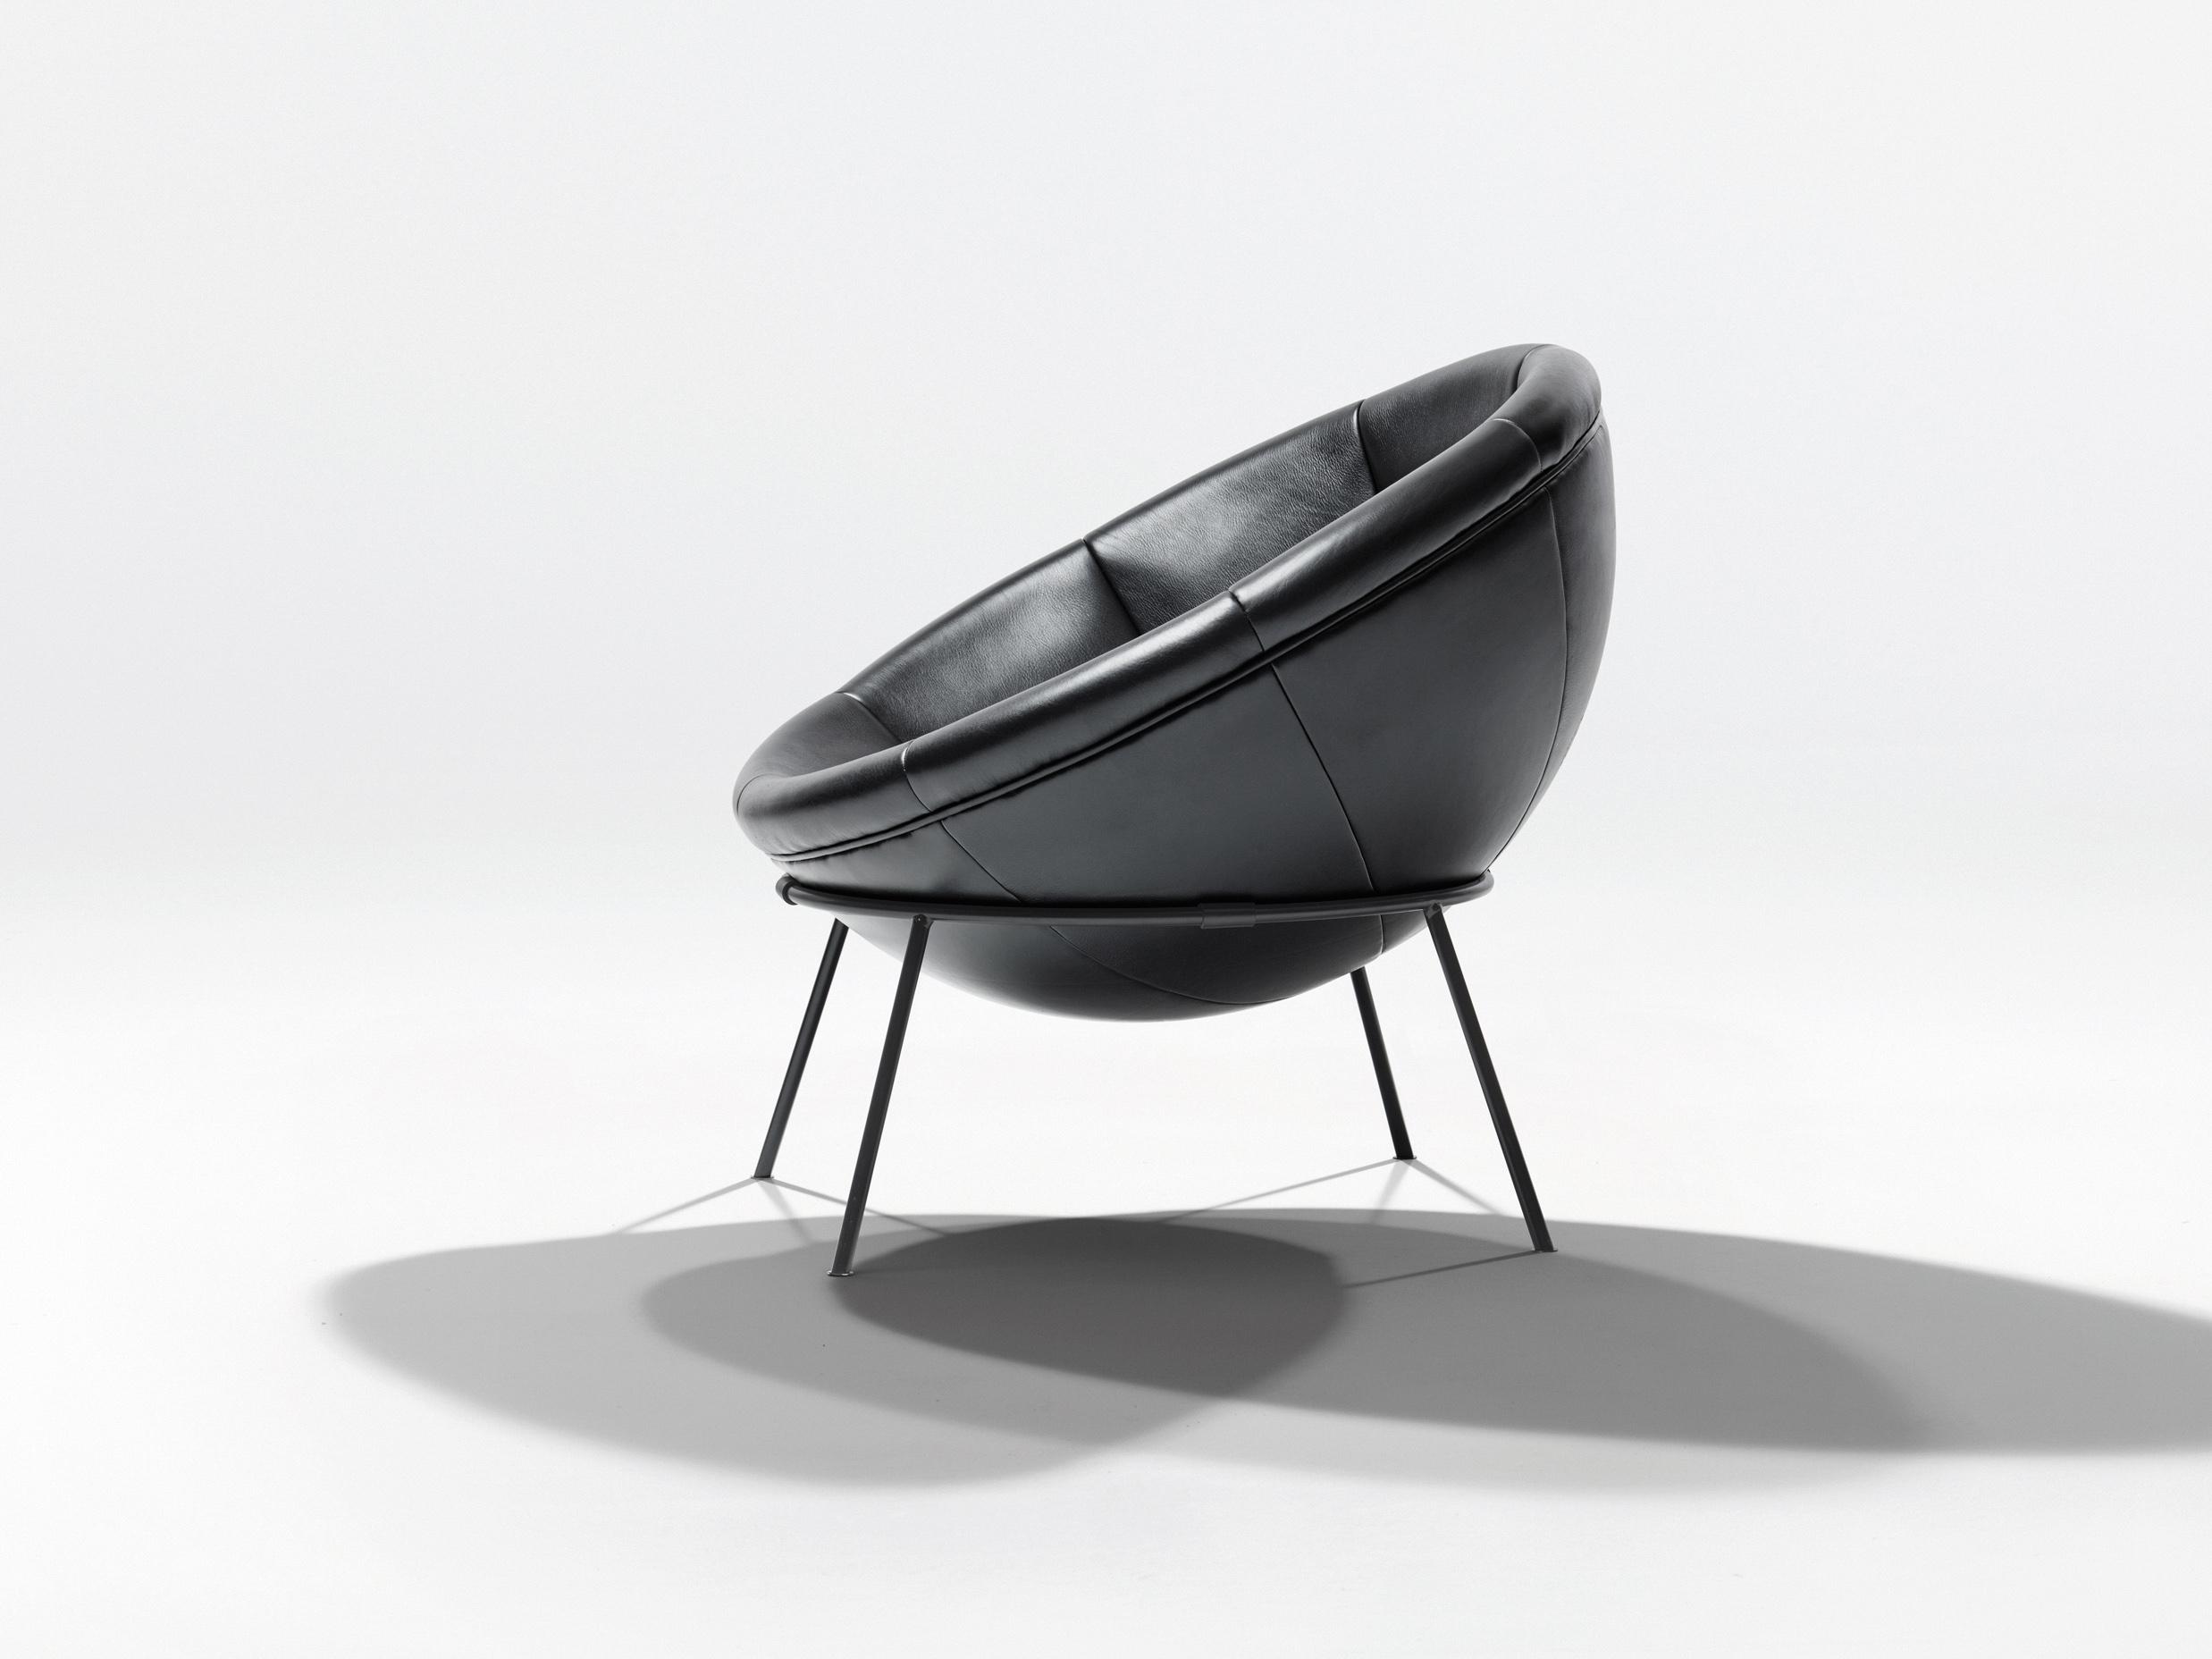 Bowl chair lina bo bardi klat for Lina bo bardi bowl